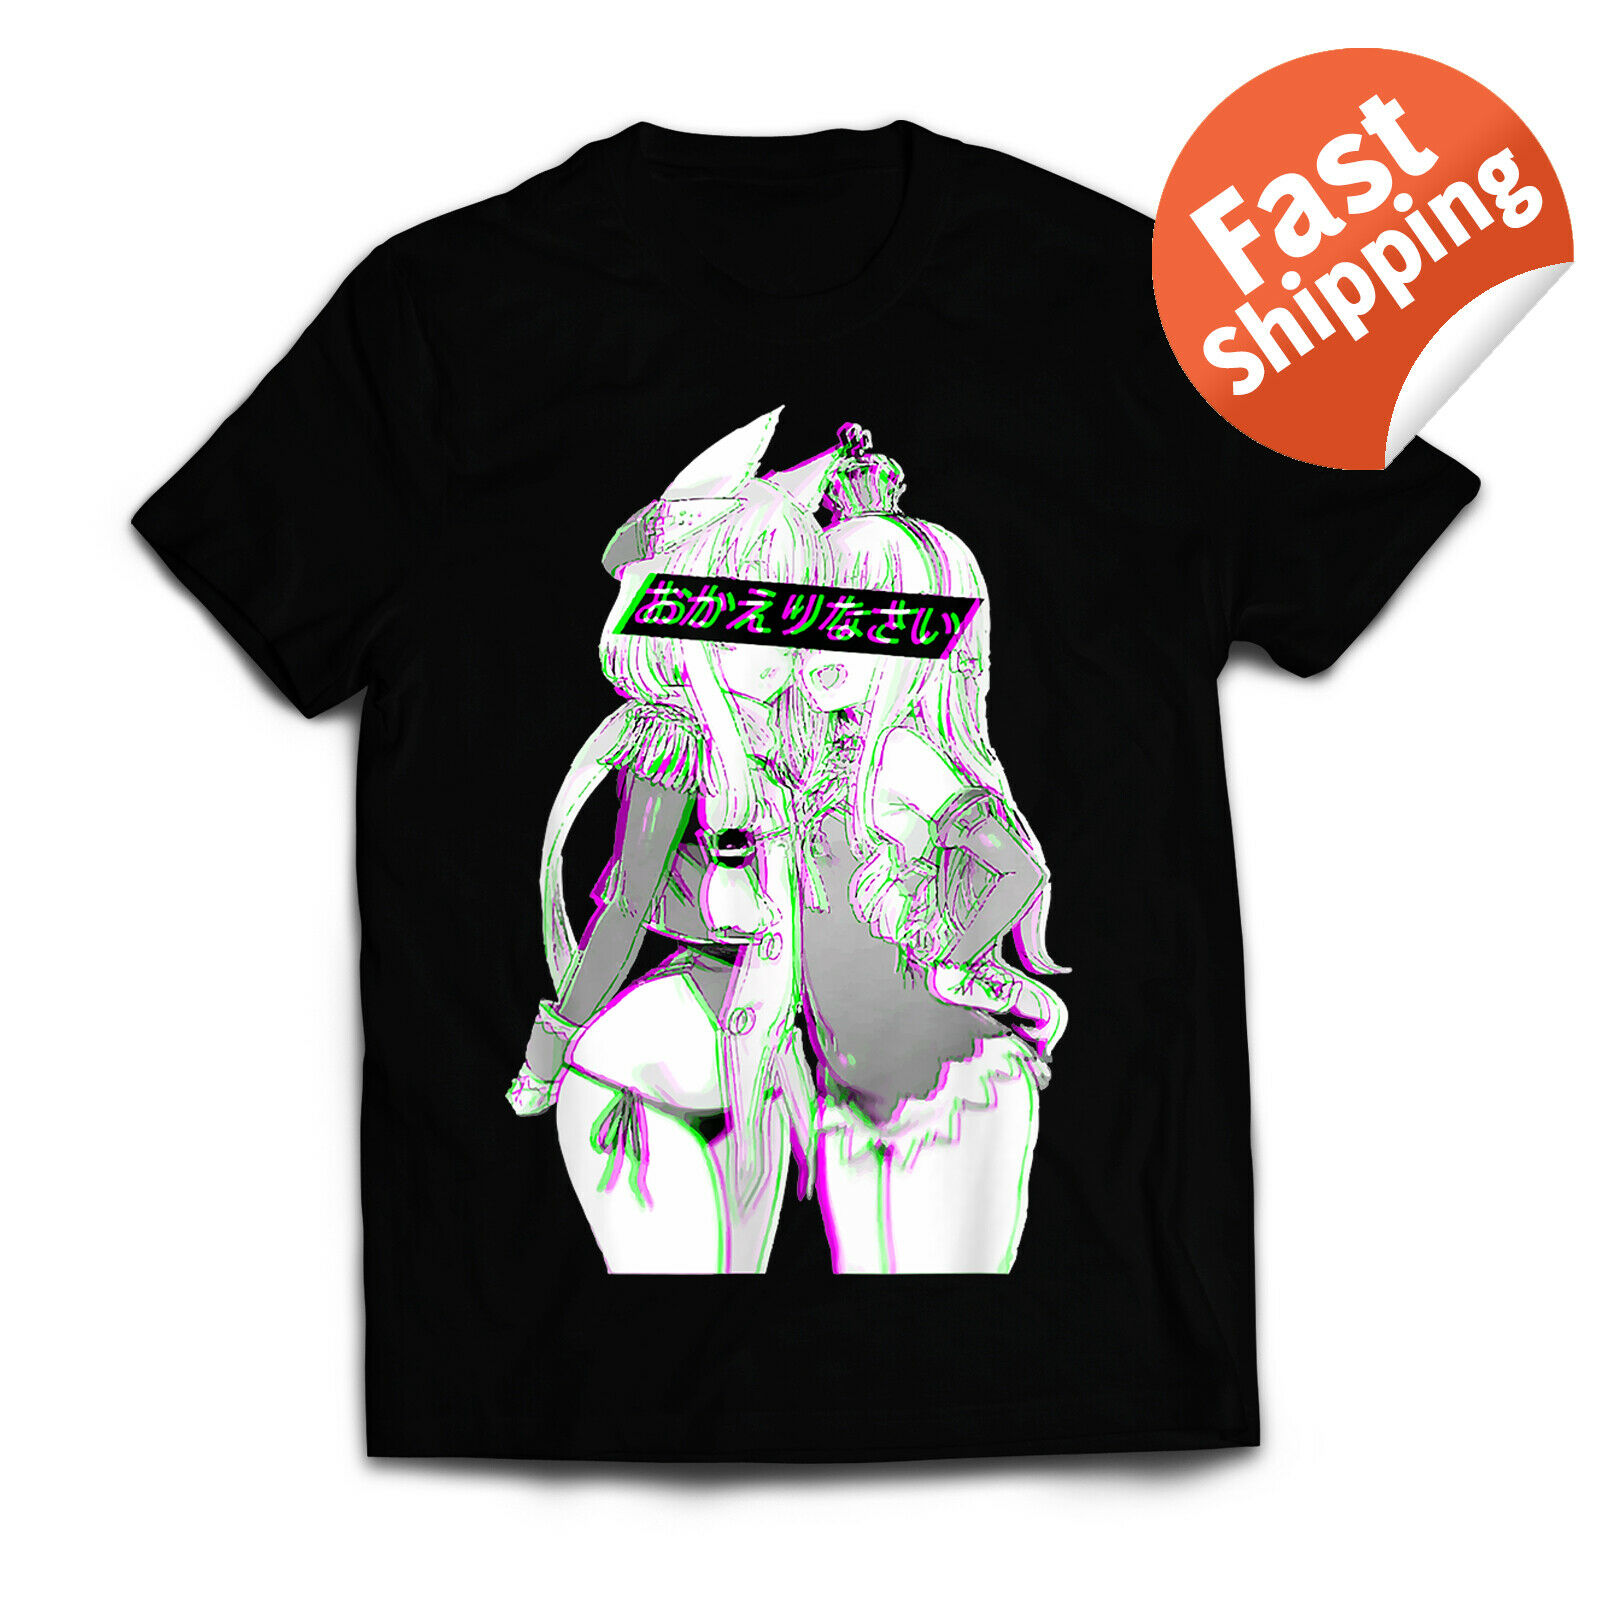 Welcome Home Senpai, Hentai ,  Parody T-Shirt Cotton Men T-Shirts Classical 2019 O Neck Streetwear Hip Hop Tops Tee